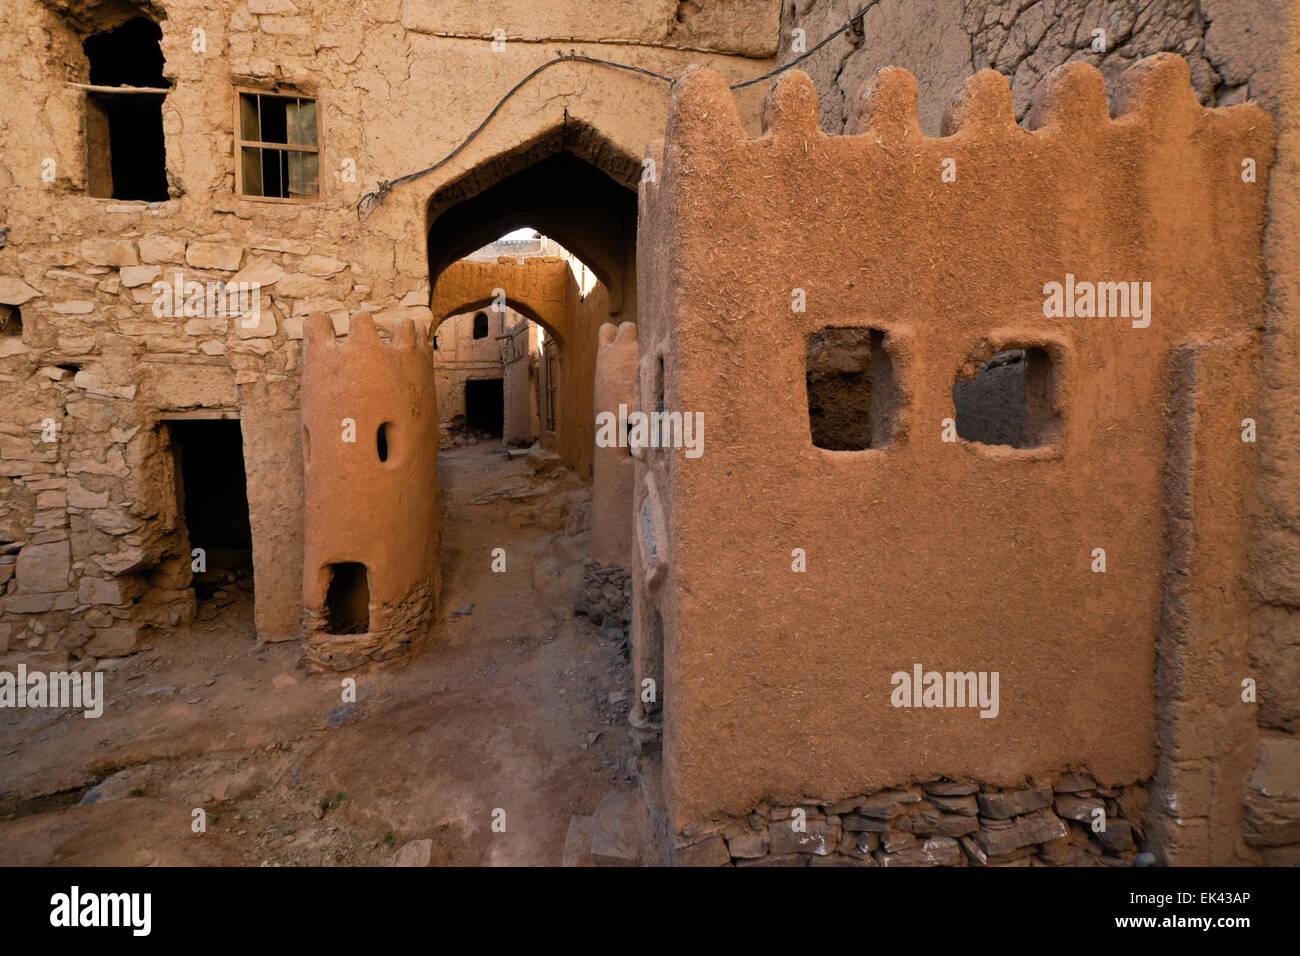 Decrepit mudbrick buildings in old section of Al-Hamra, Oman - Stock Image